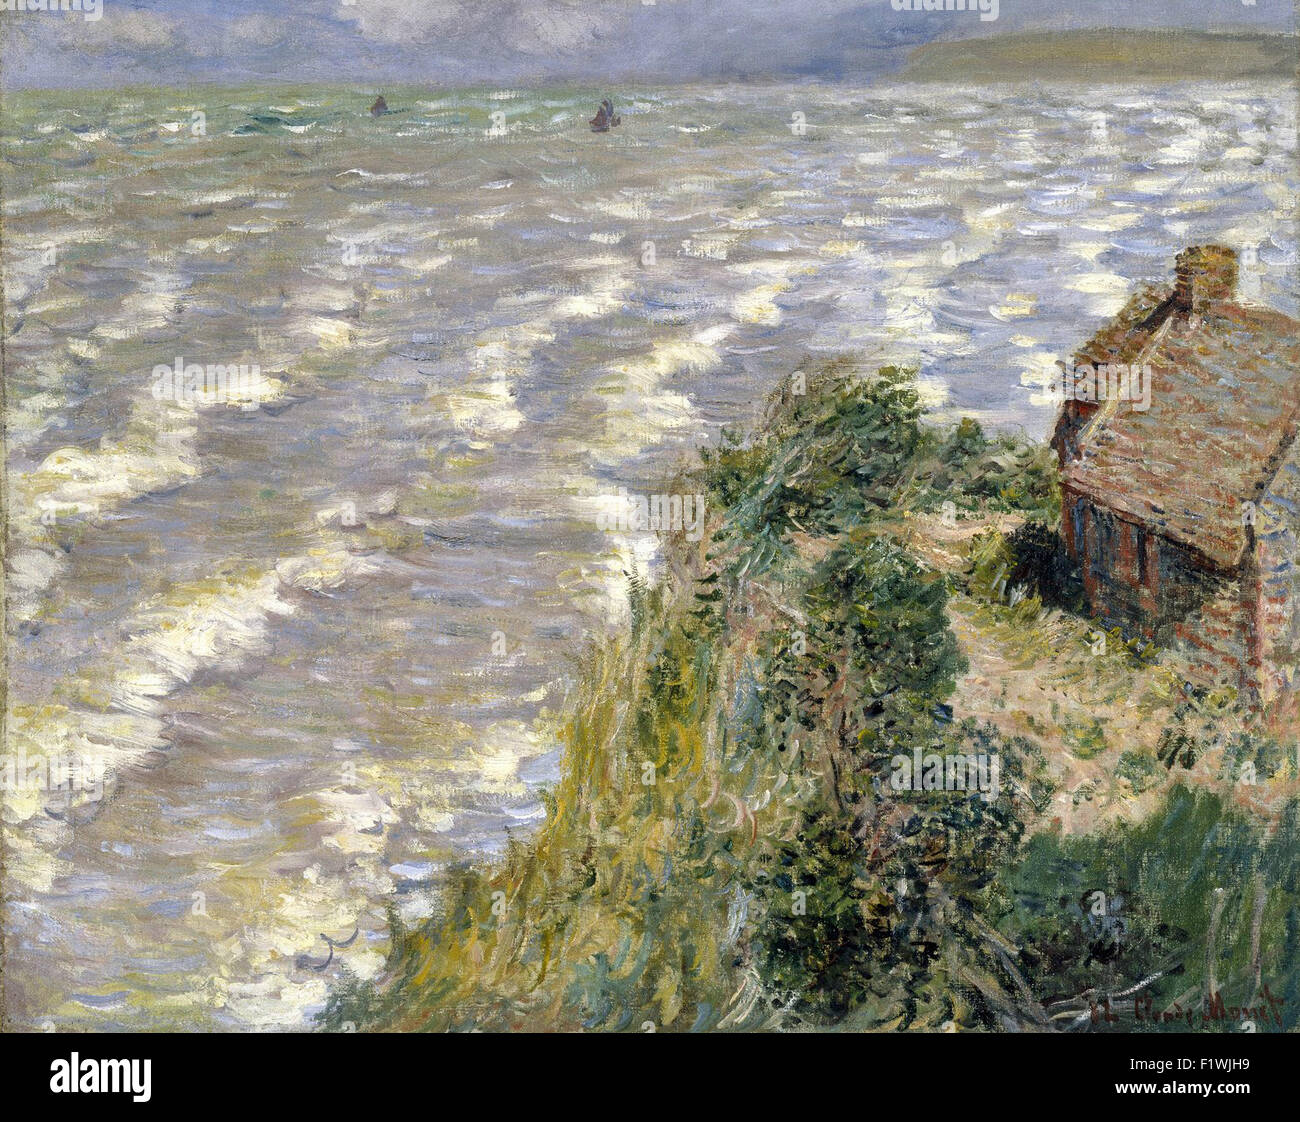 Claude Monet - Rising Tide at Pourville 15 - Stock Image